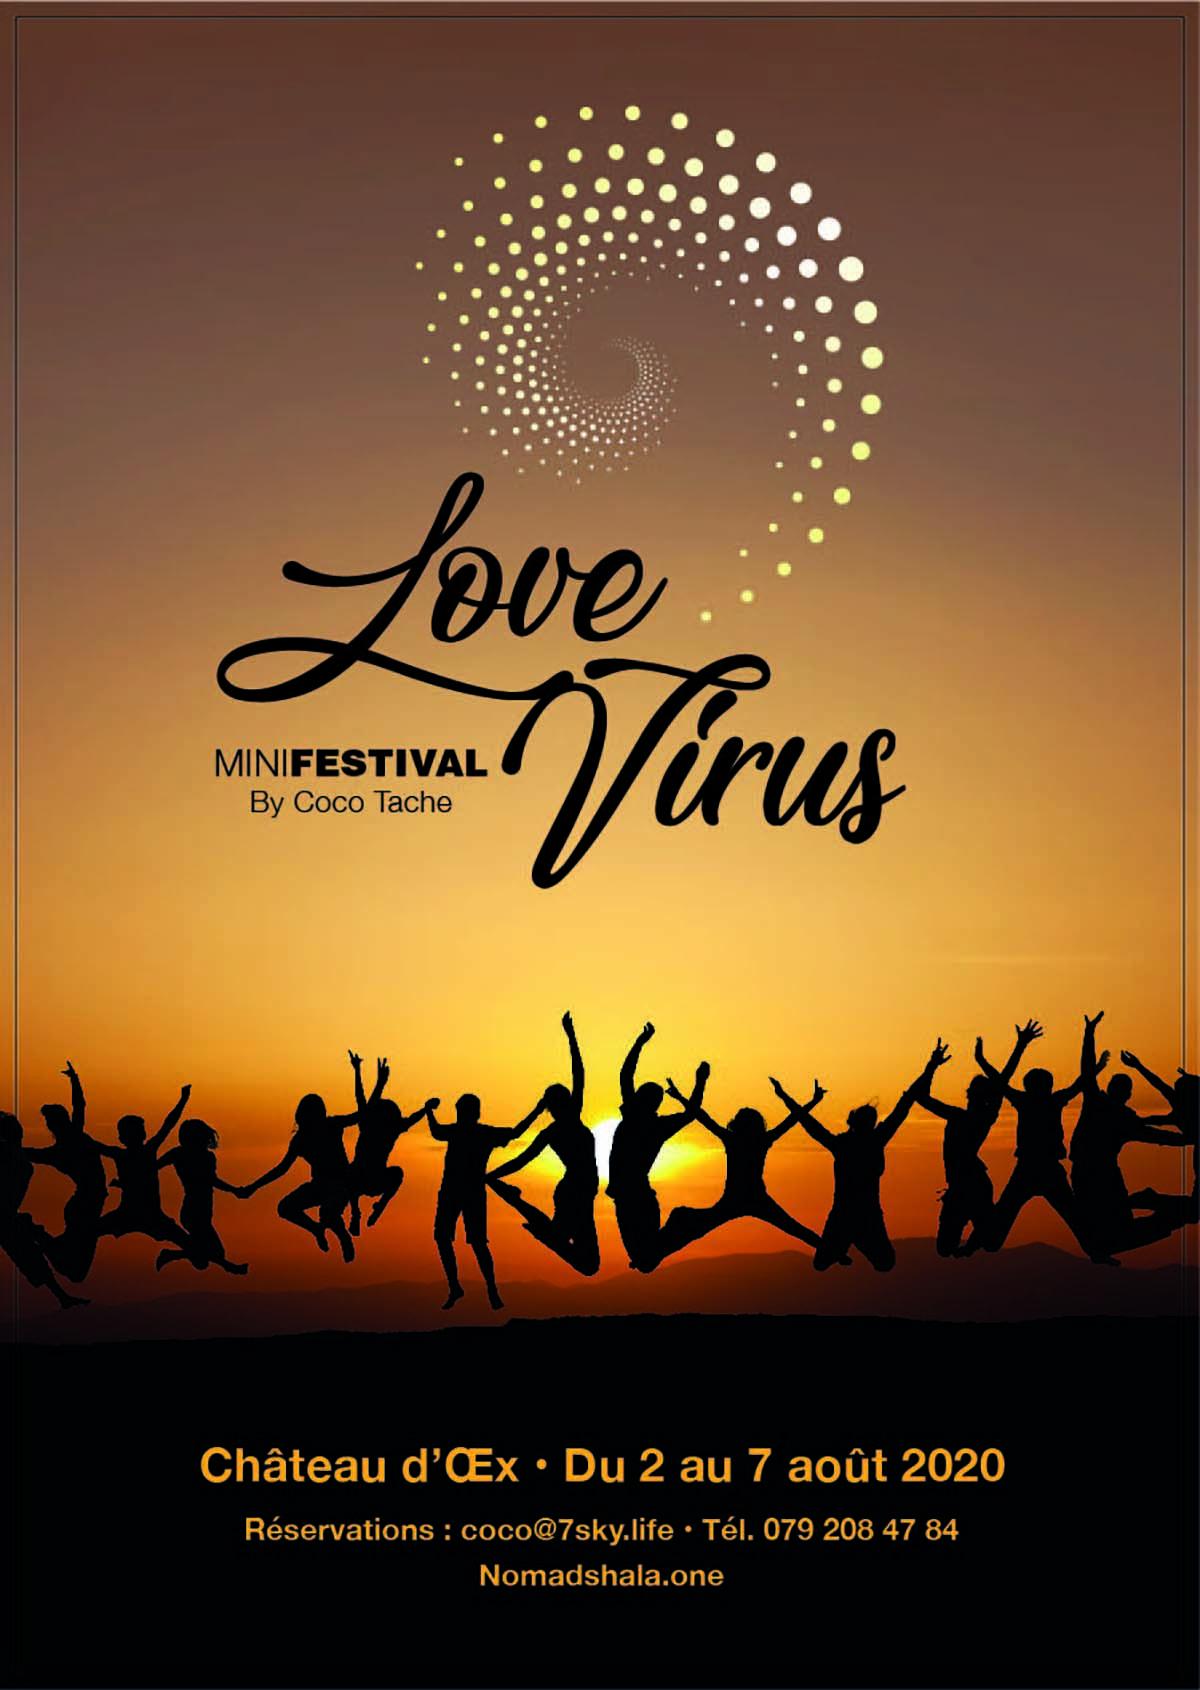 LoveVirus Minifestival by Coco Tache, Château d'Oex, du 2 au 7 août 2020